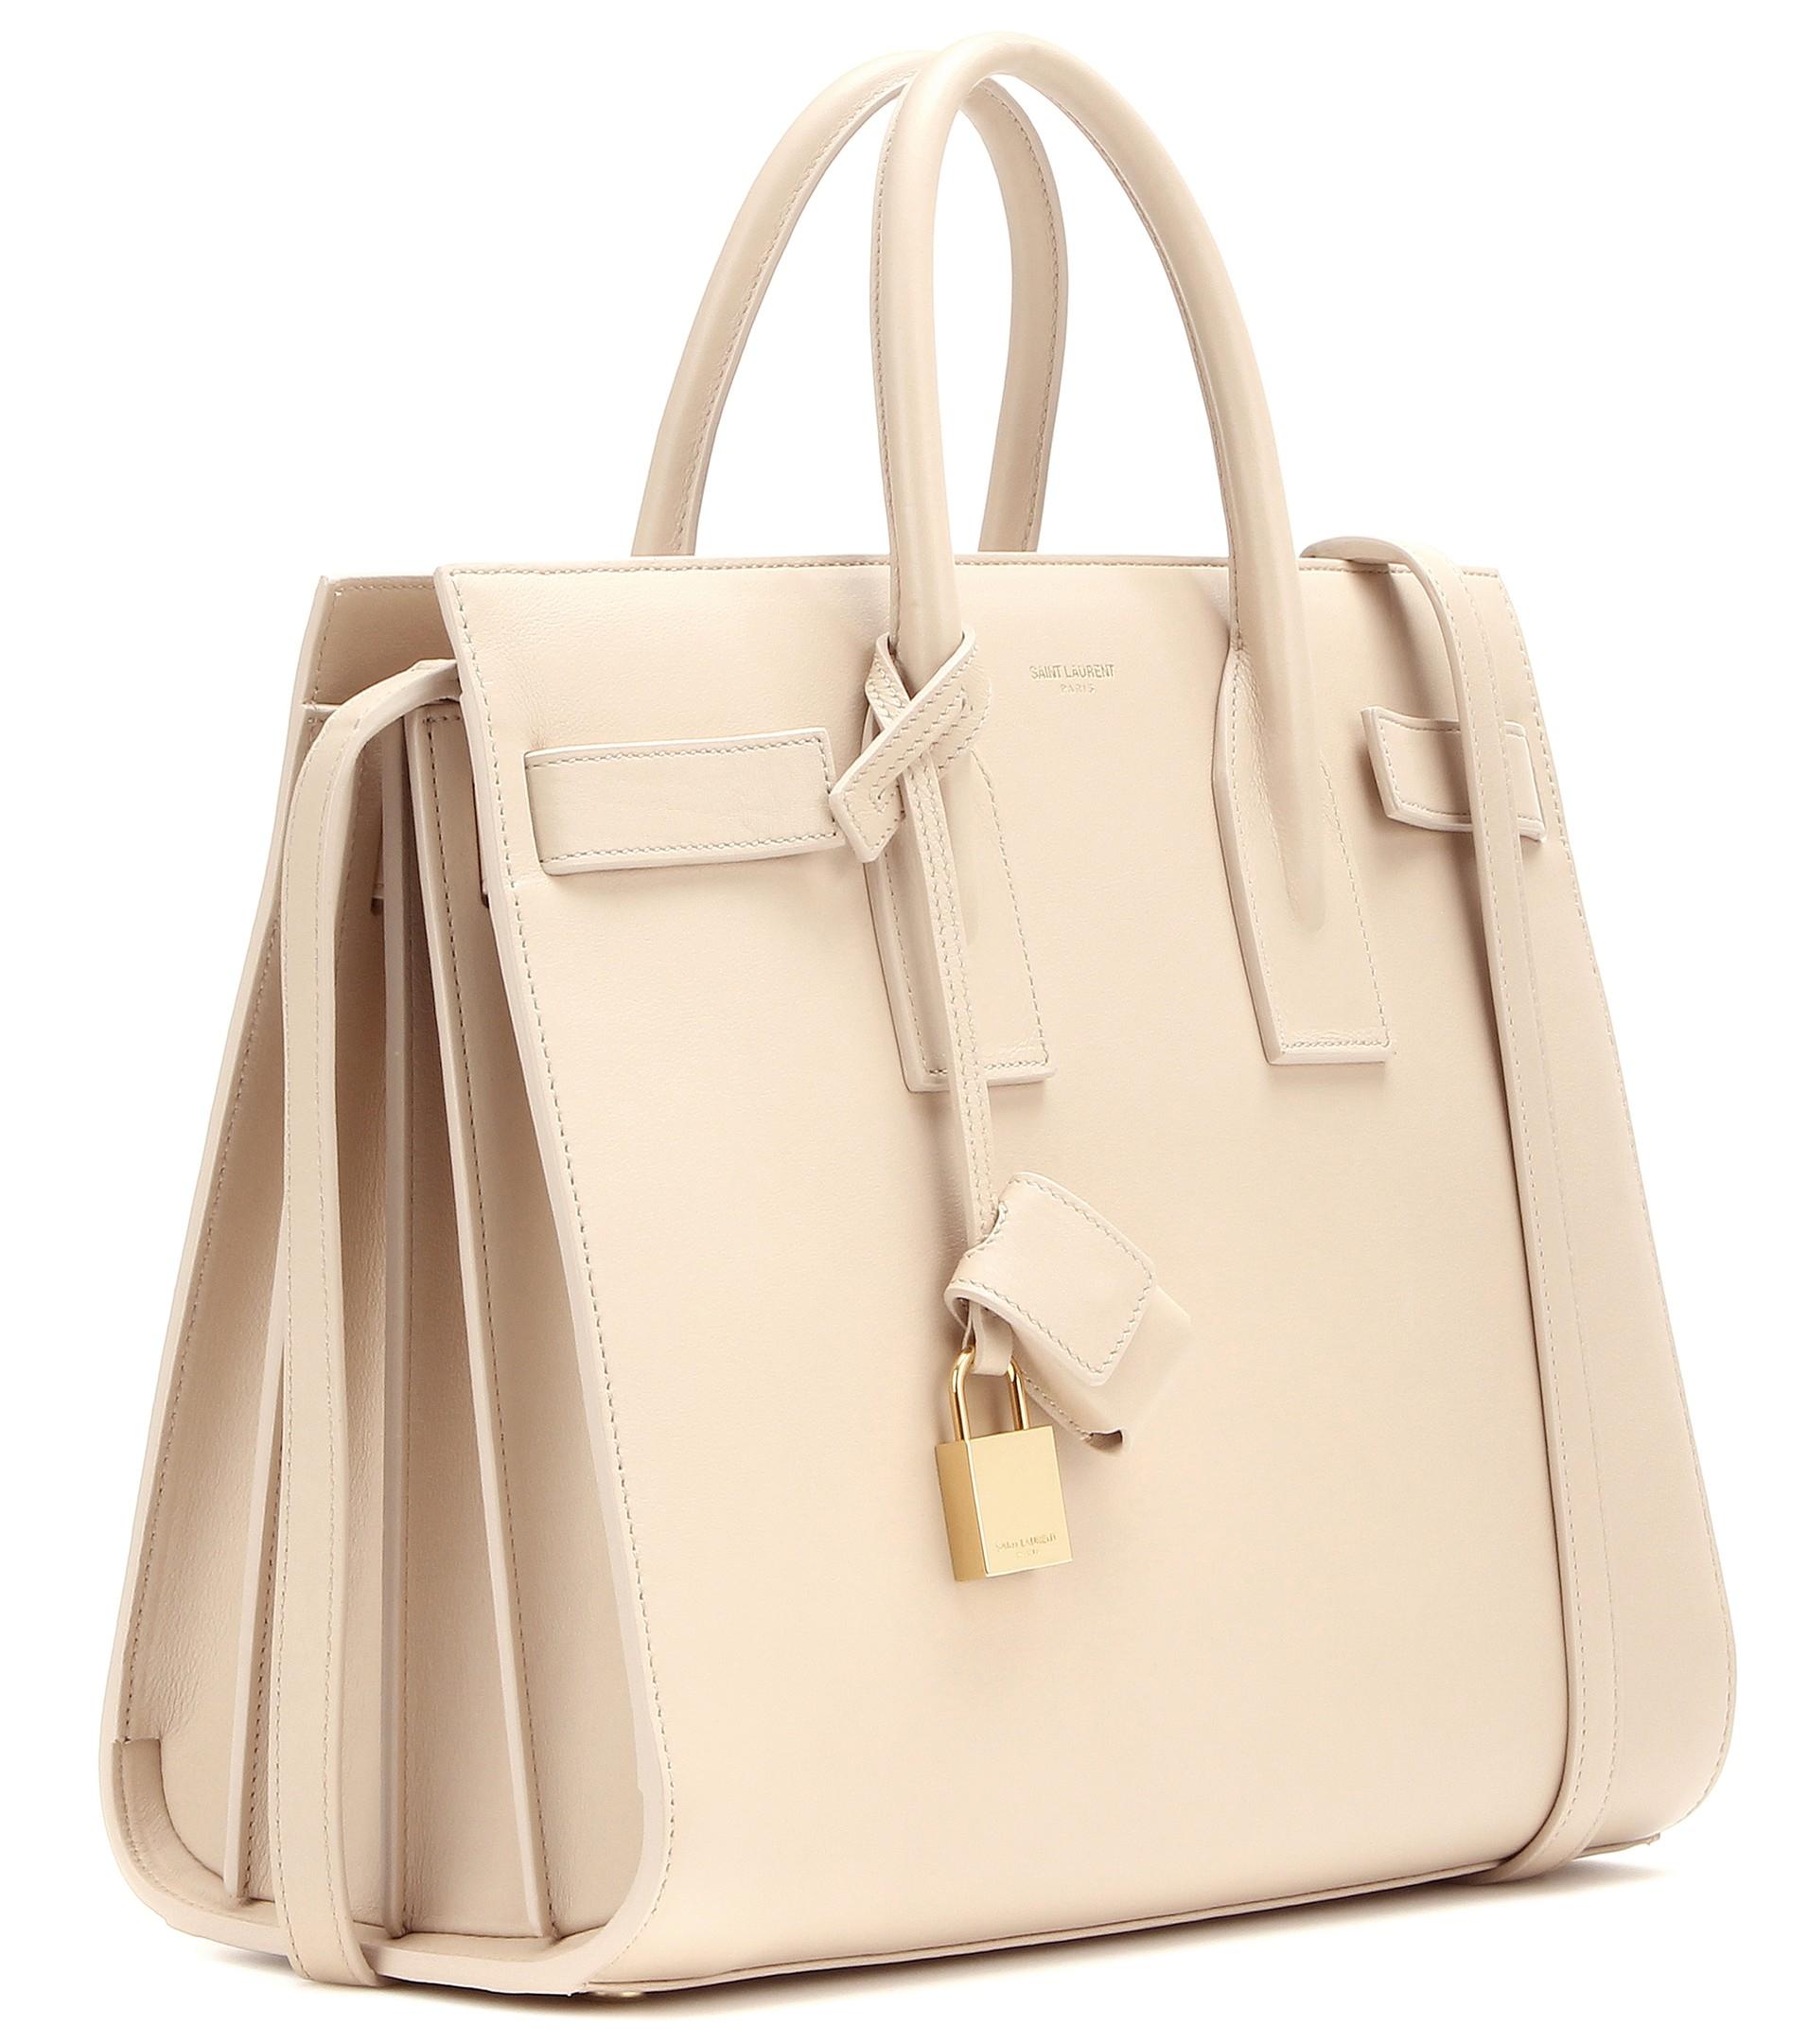 ysl logo bag - sac de jour small satchel bag, taupe